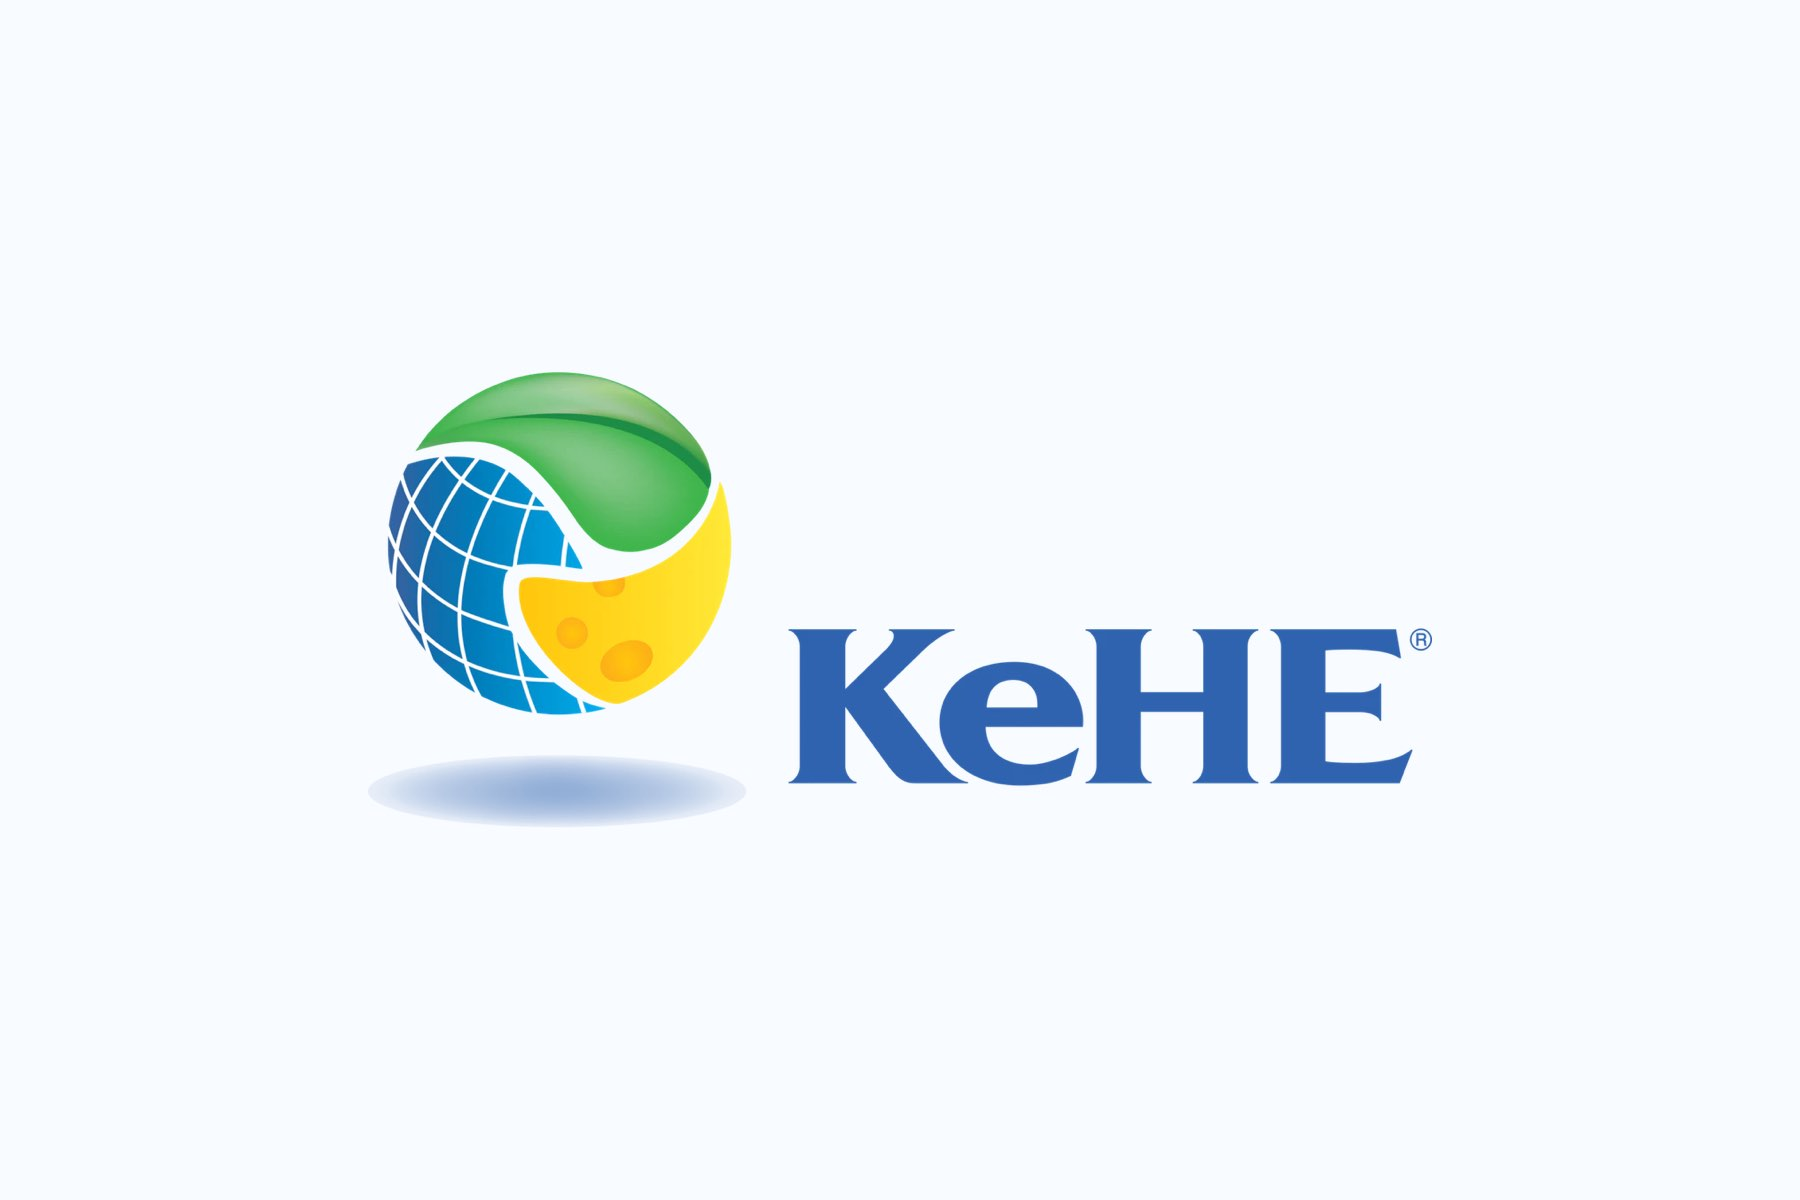 Image of KeHe logo.